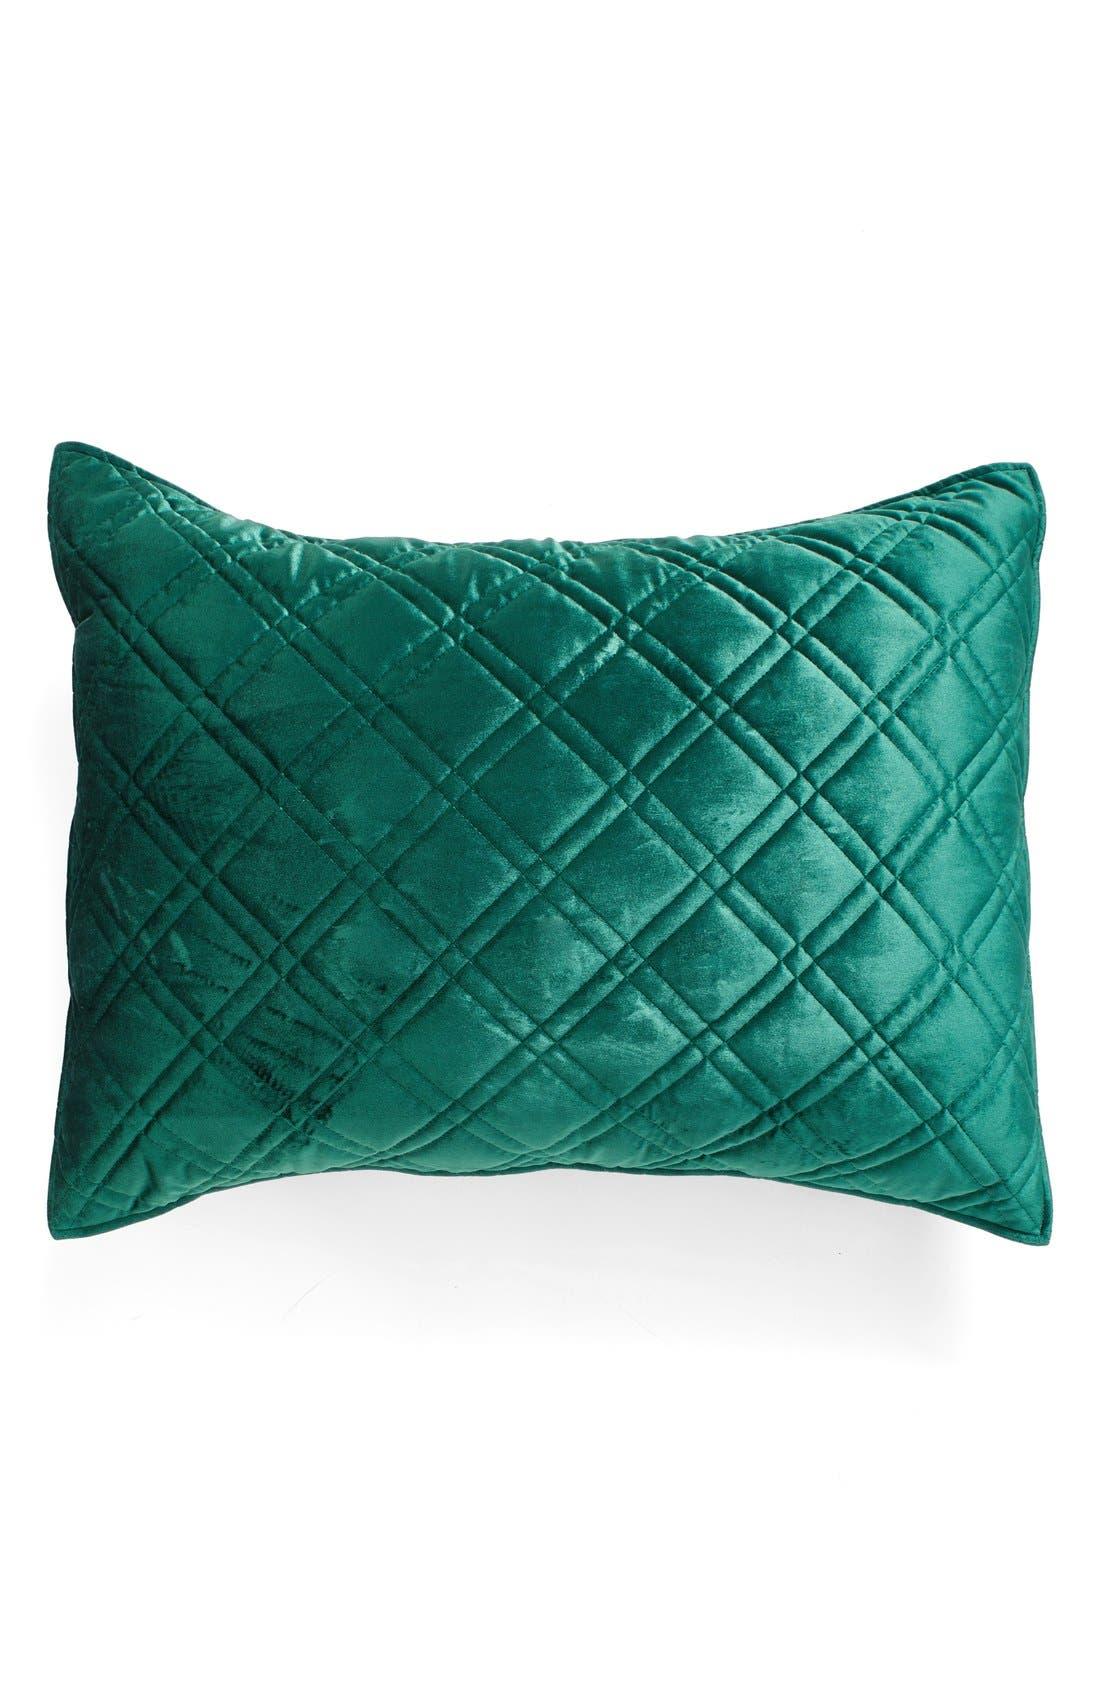 Quilted Velvet Standard Sham,                         Main,                         color, Emerald